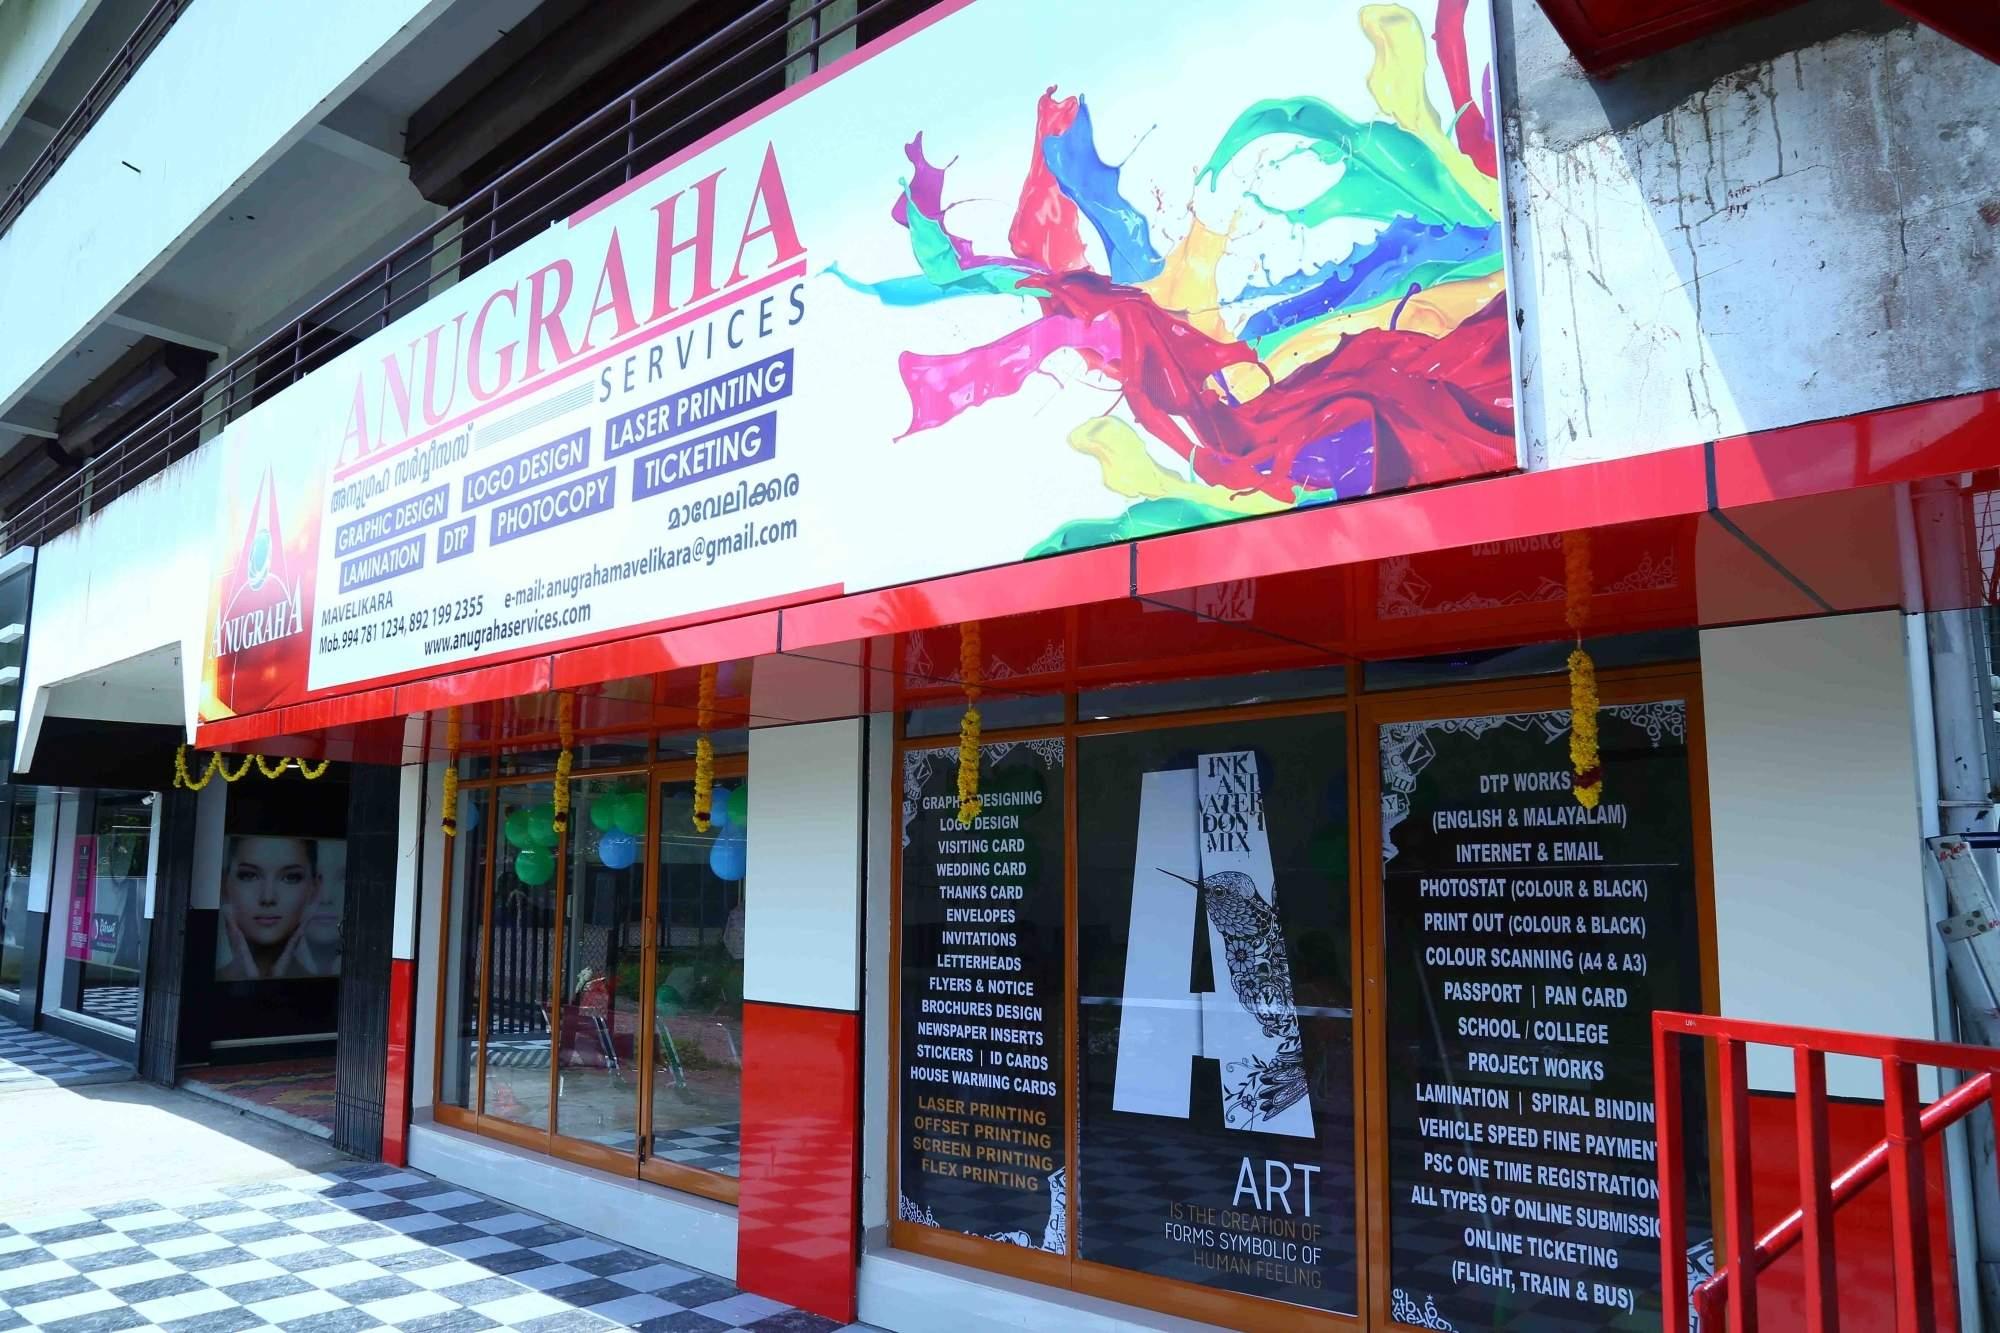 Anugraha Designers & Printers, GRAPHICS & DIGITAL PRINTING,  service in Mavelikkara, Alappuzha